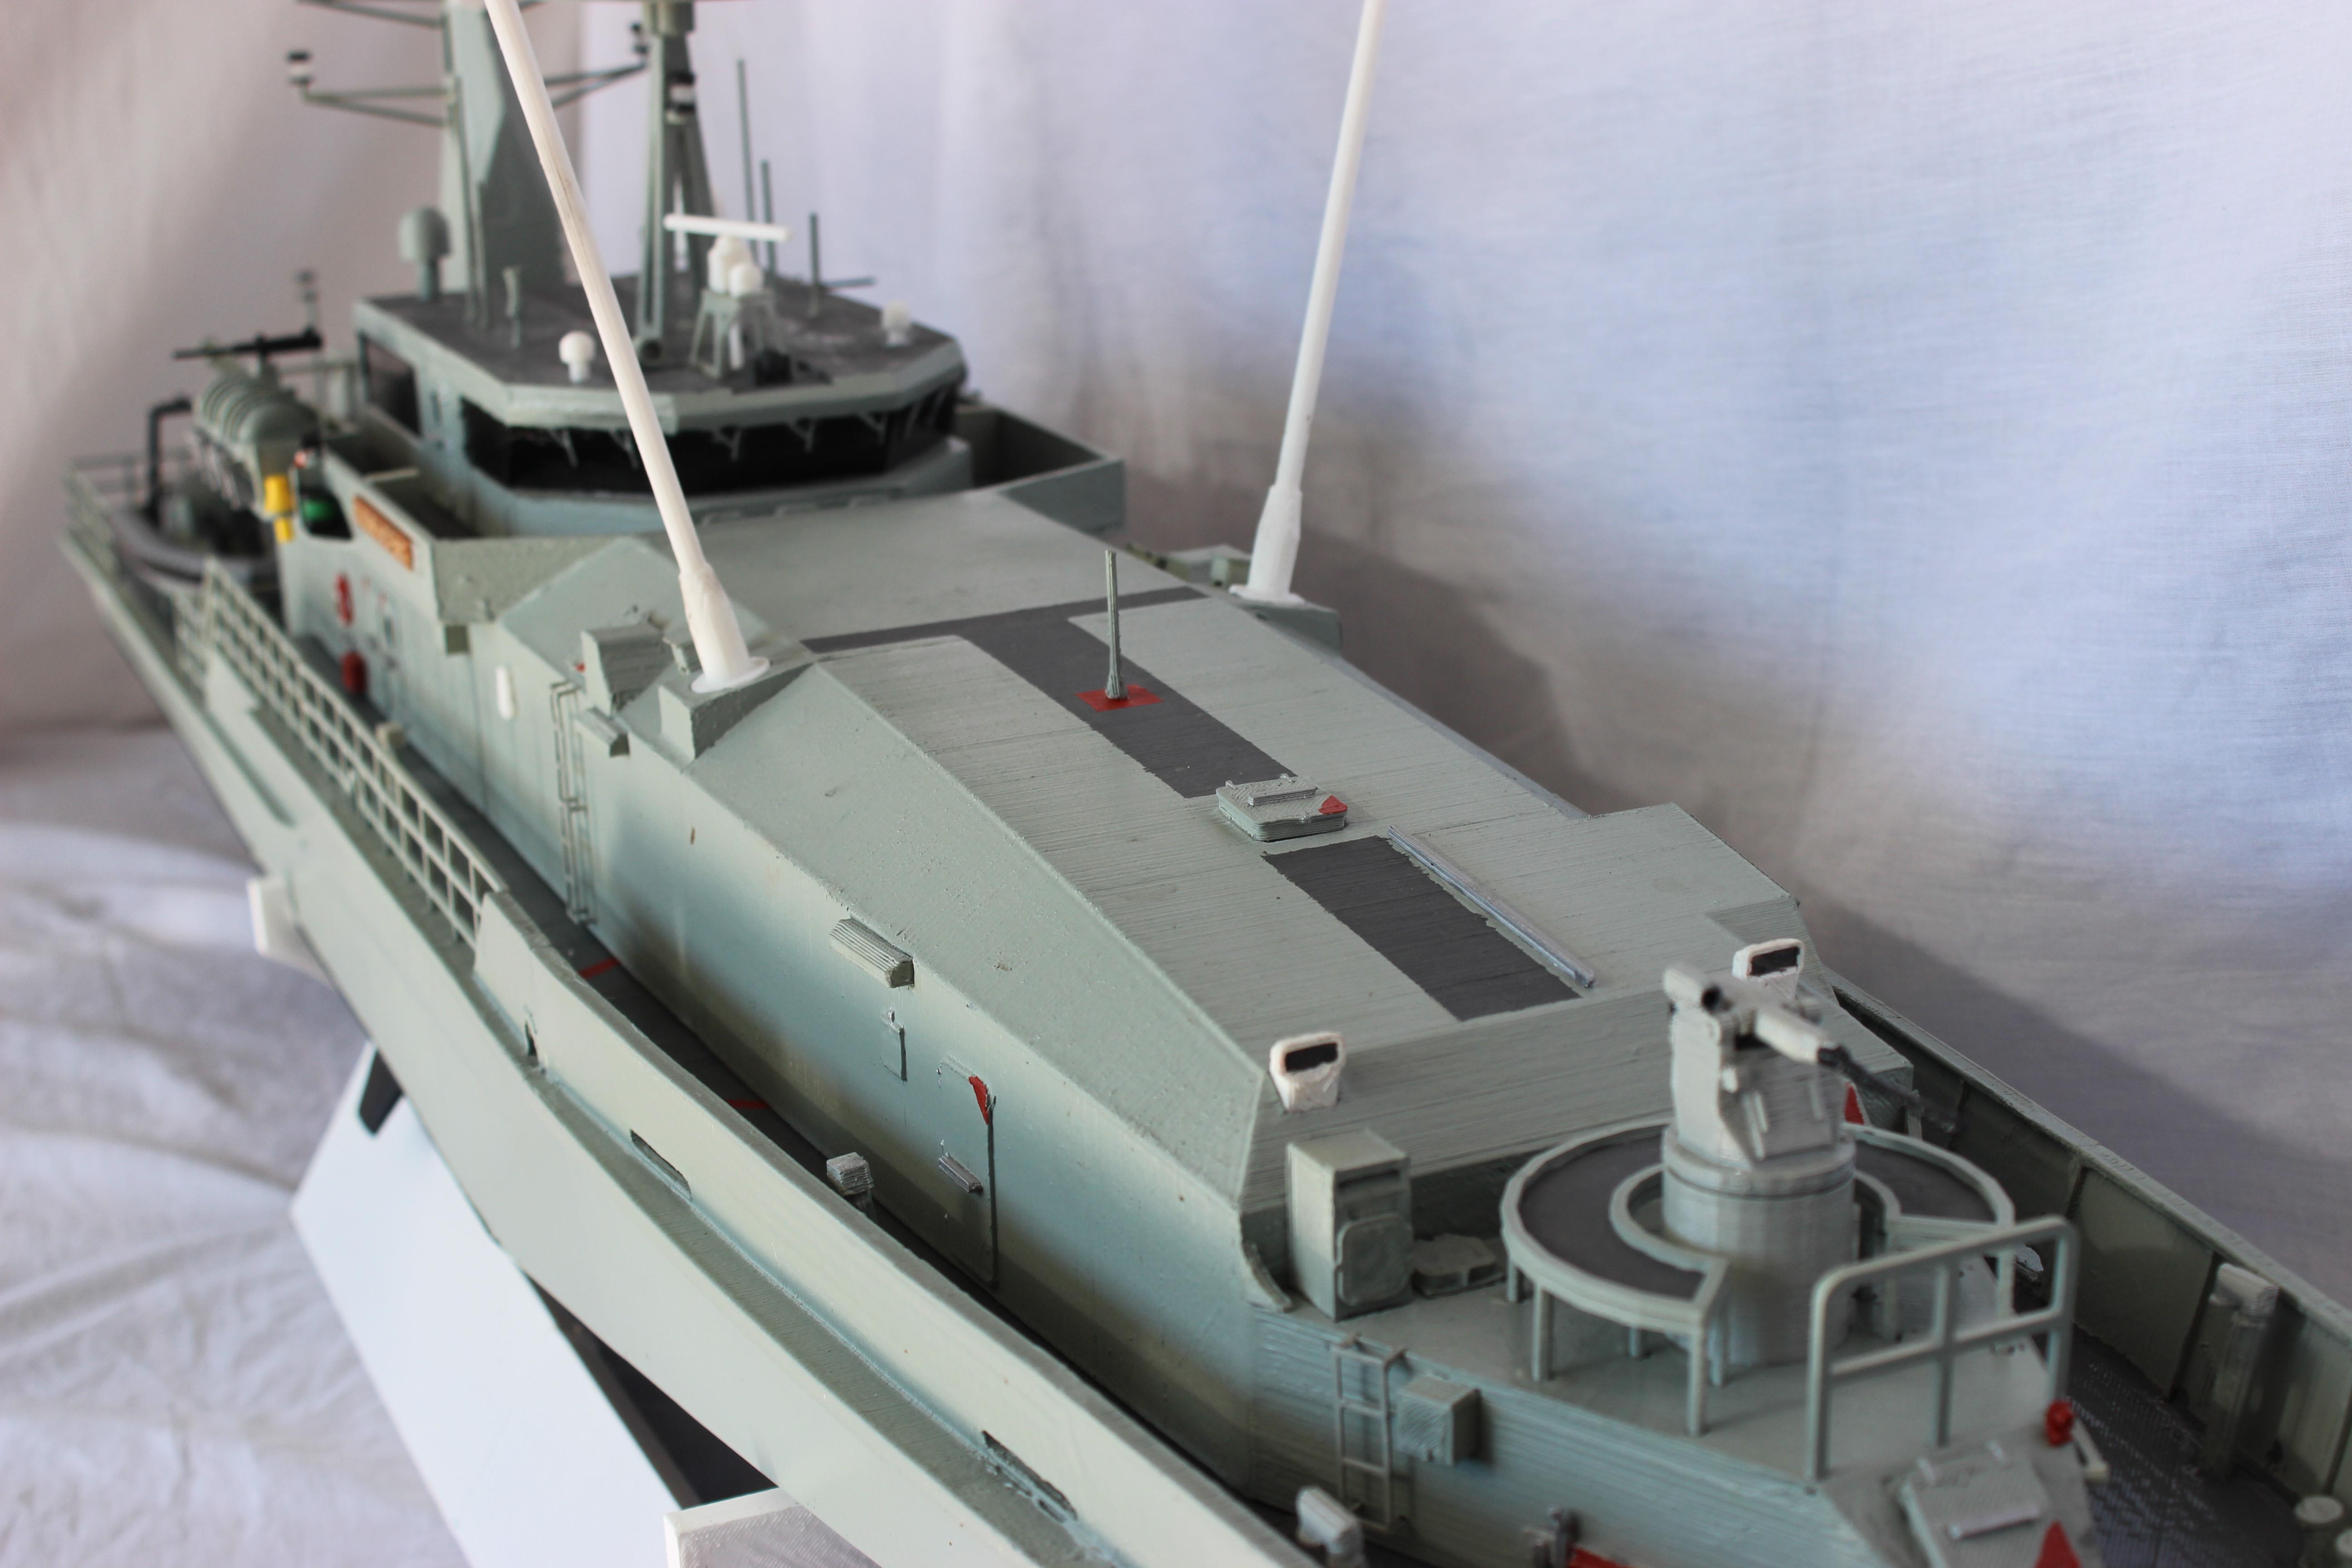 Giant 1 7 metre 3d printed RC ship - 3D Printing / 3D Printers